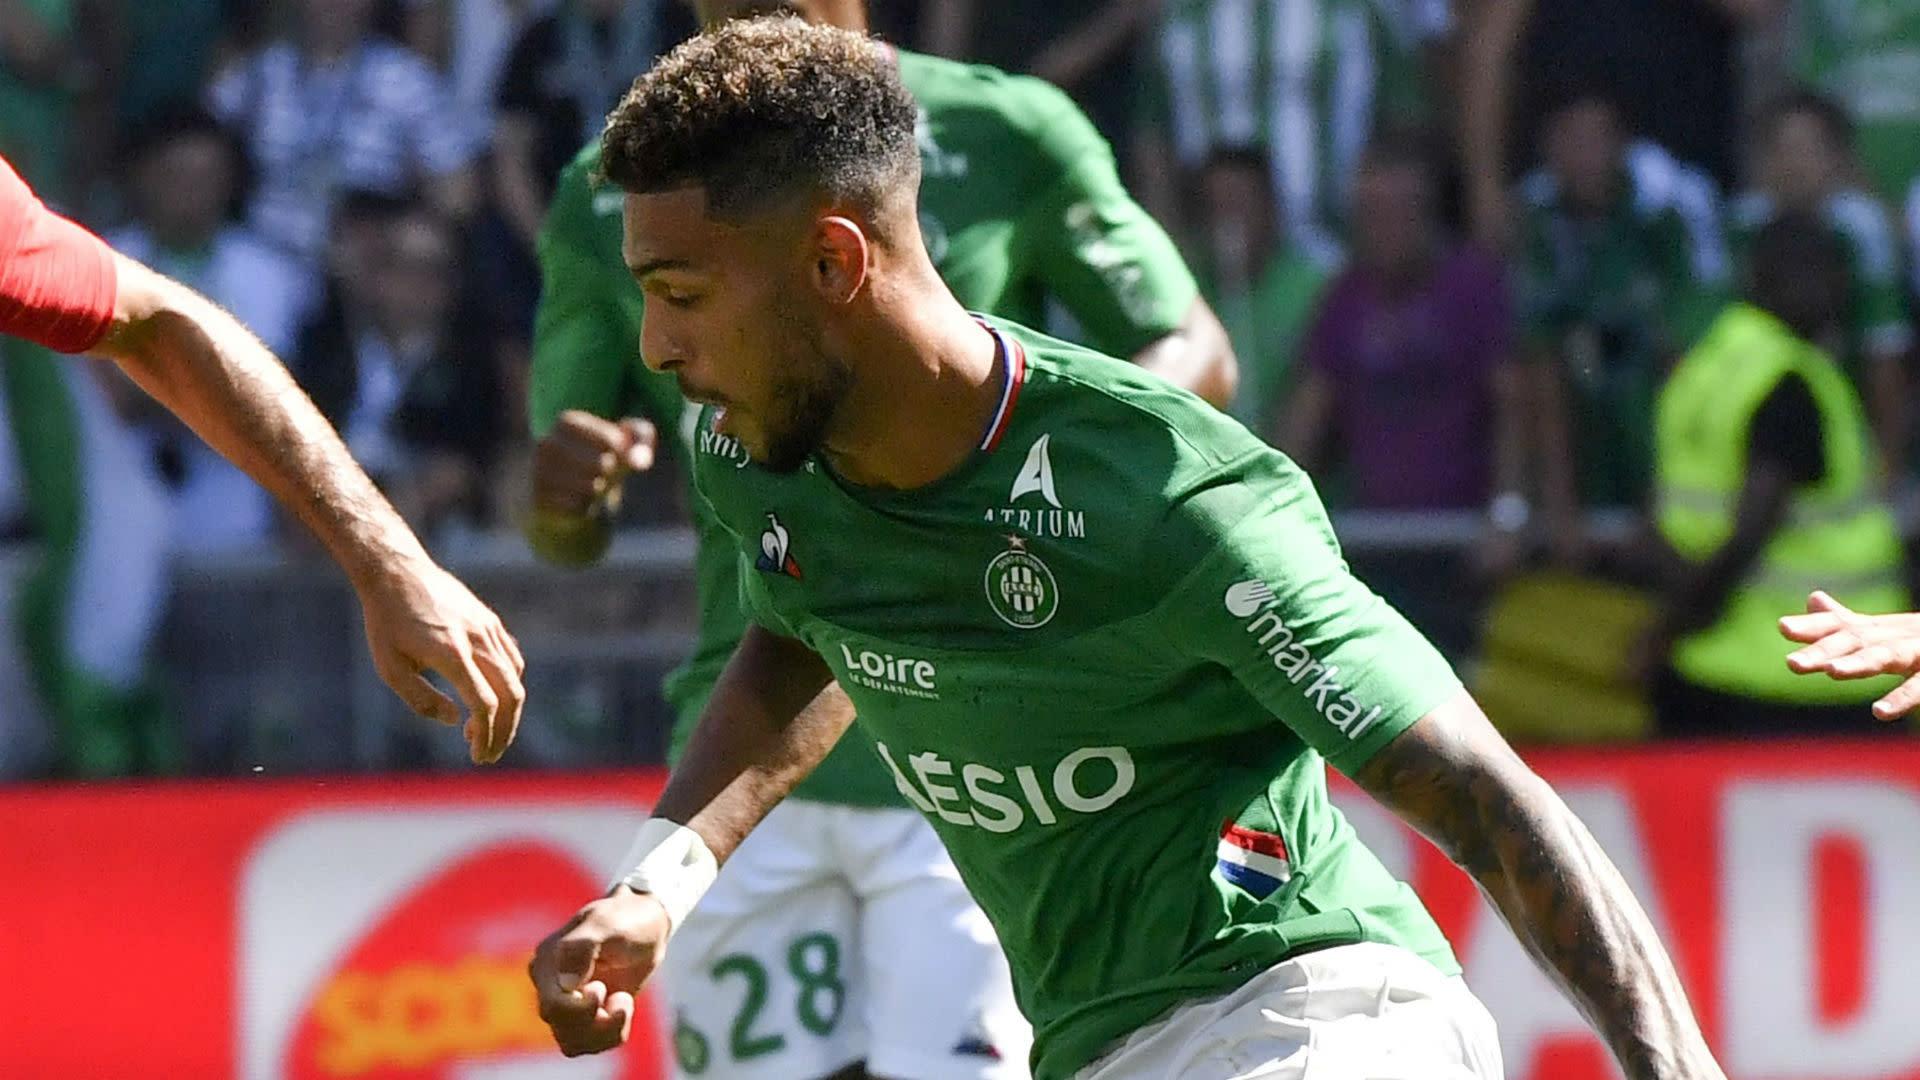 Denis Bouanga Rescues Saint Etienne Against Brest In Ligue